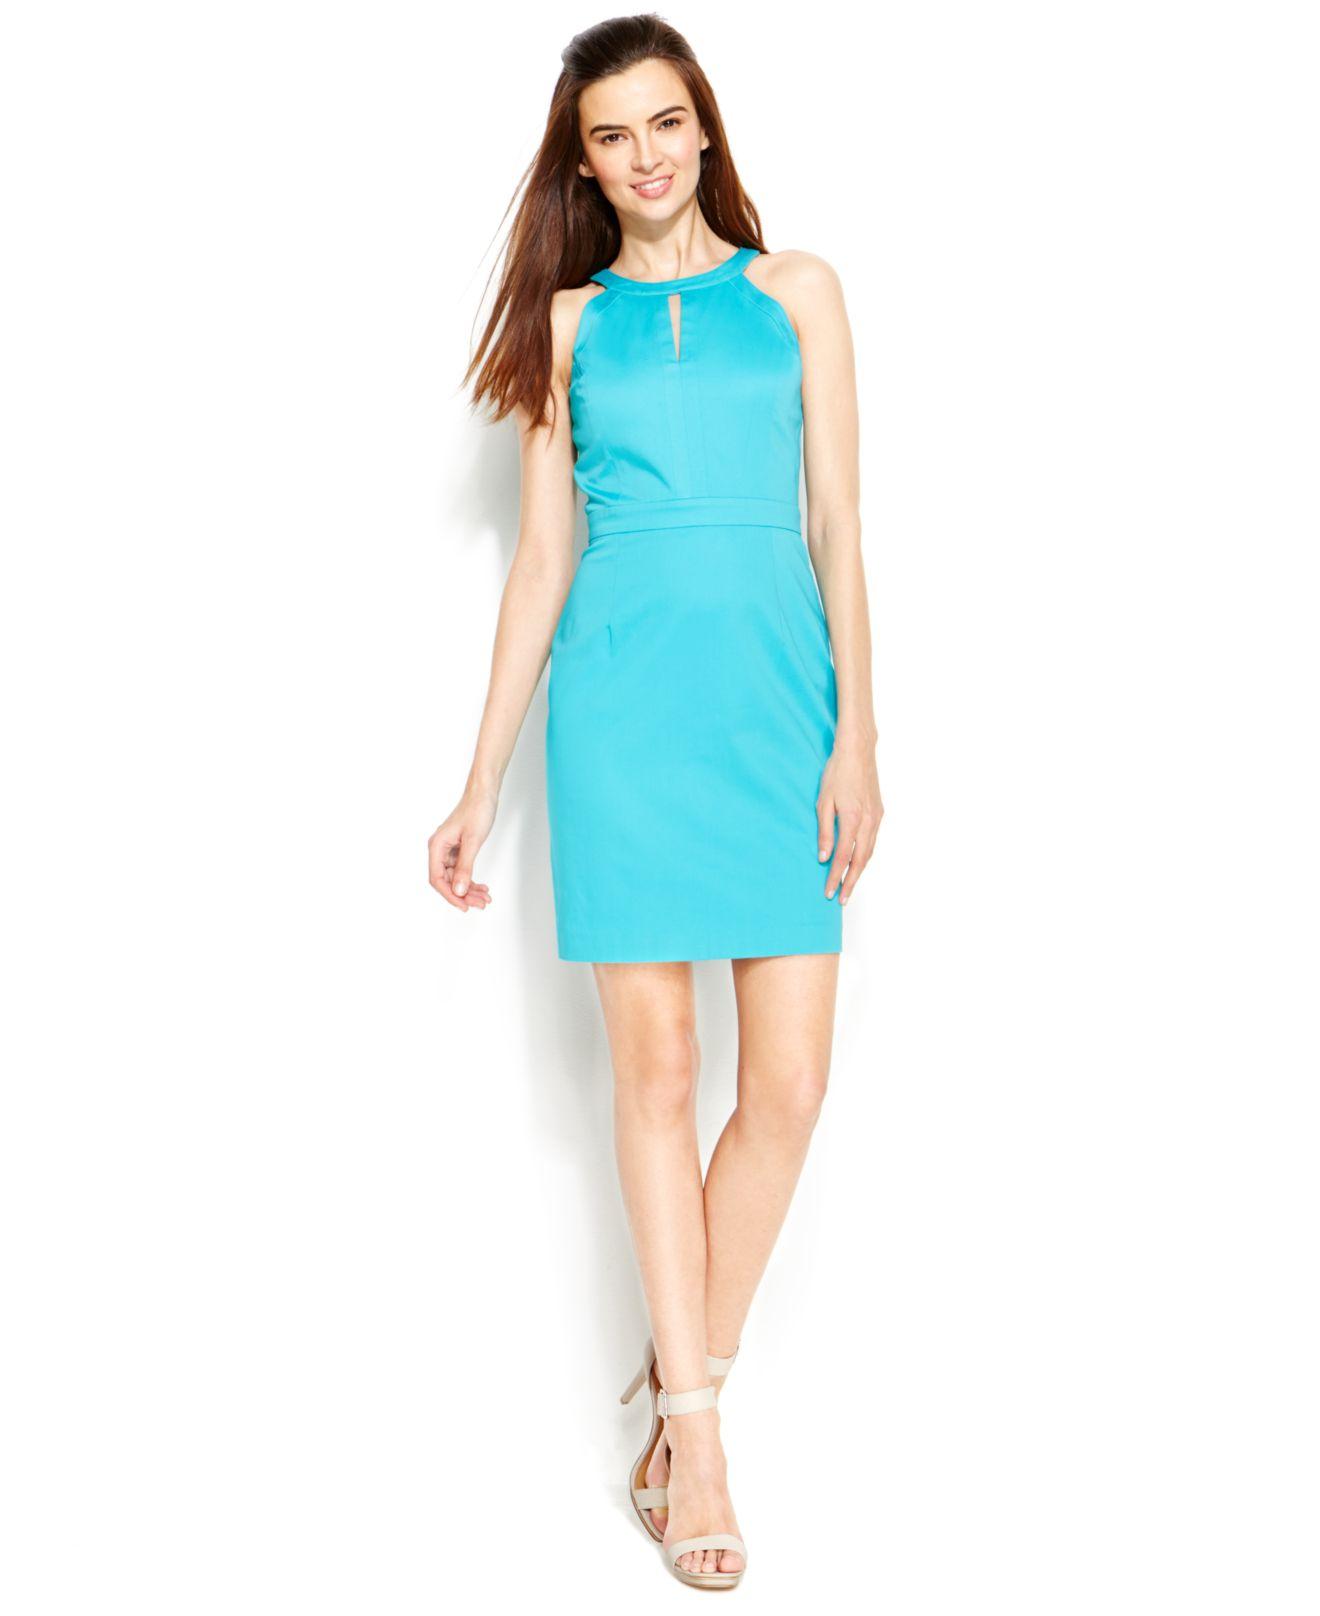 Lyst - Calvin Klein Keyhole Halter Sheath Dress in Green 41655d418